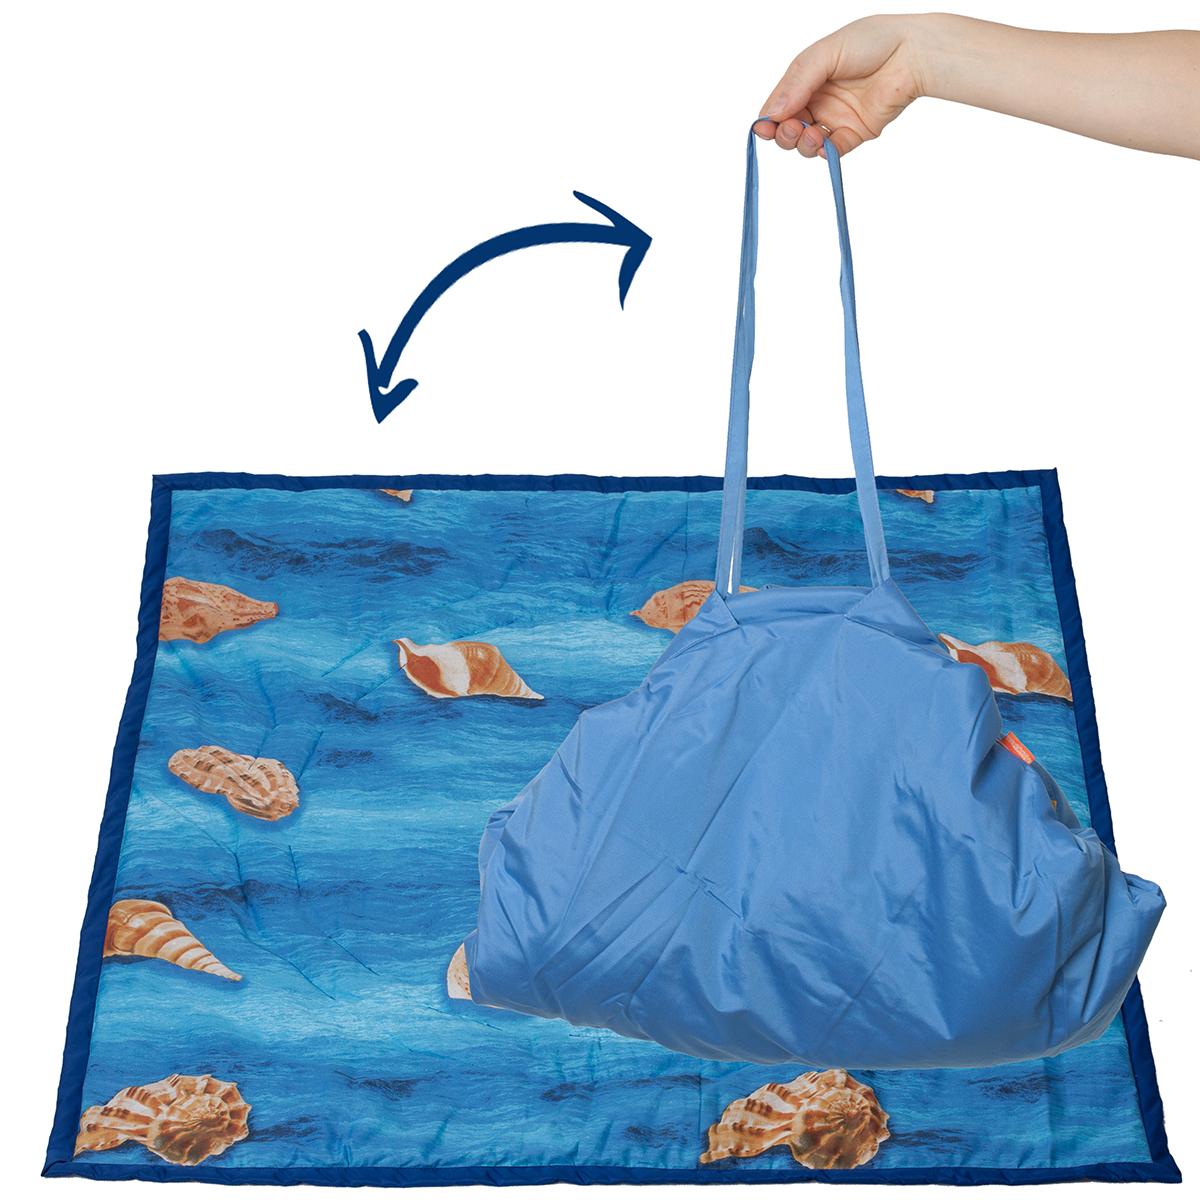 Чудо-Чадо Переносной коврик-сумка цвет синий ракушки